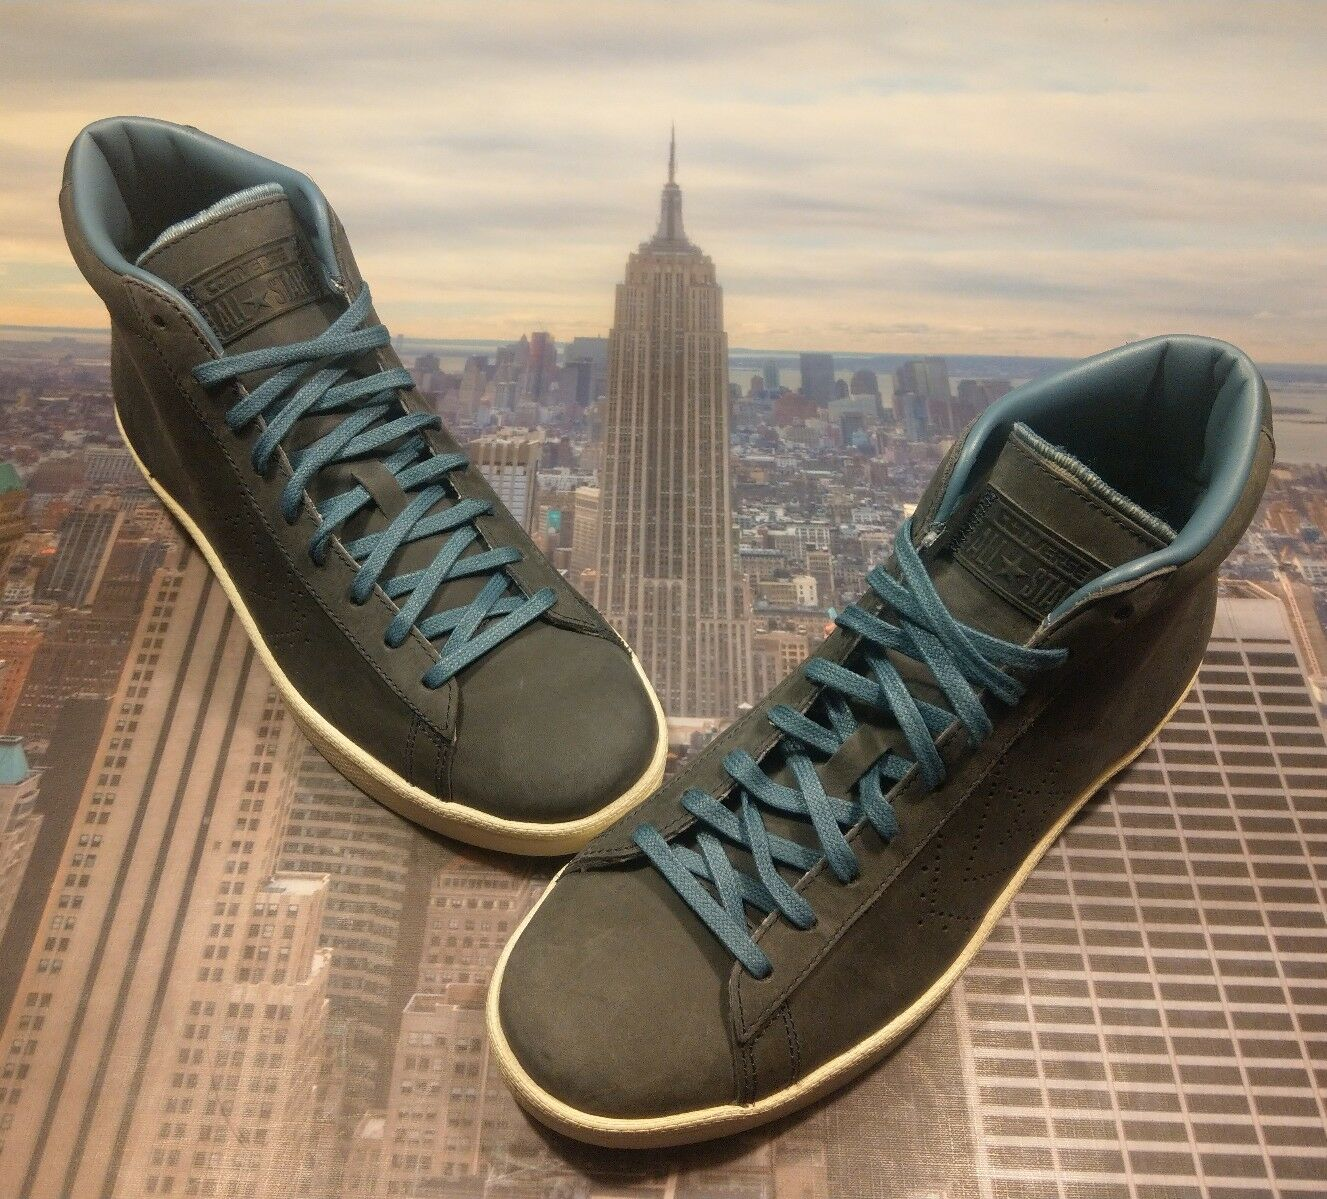 1b1b0a674d30 Buy Converse PL 76 Pro Leather 76 Mid Top Blue Coast blue Size 9.5 ...